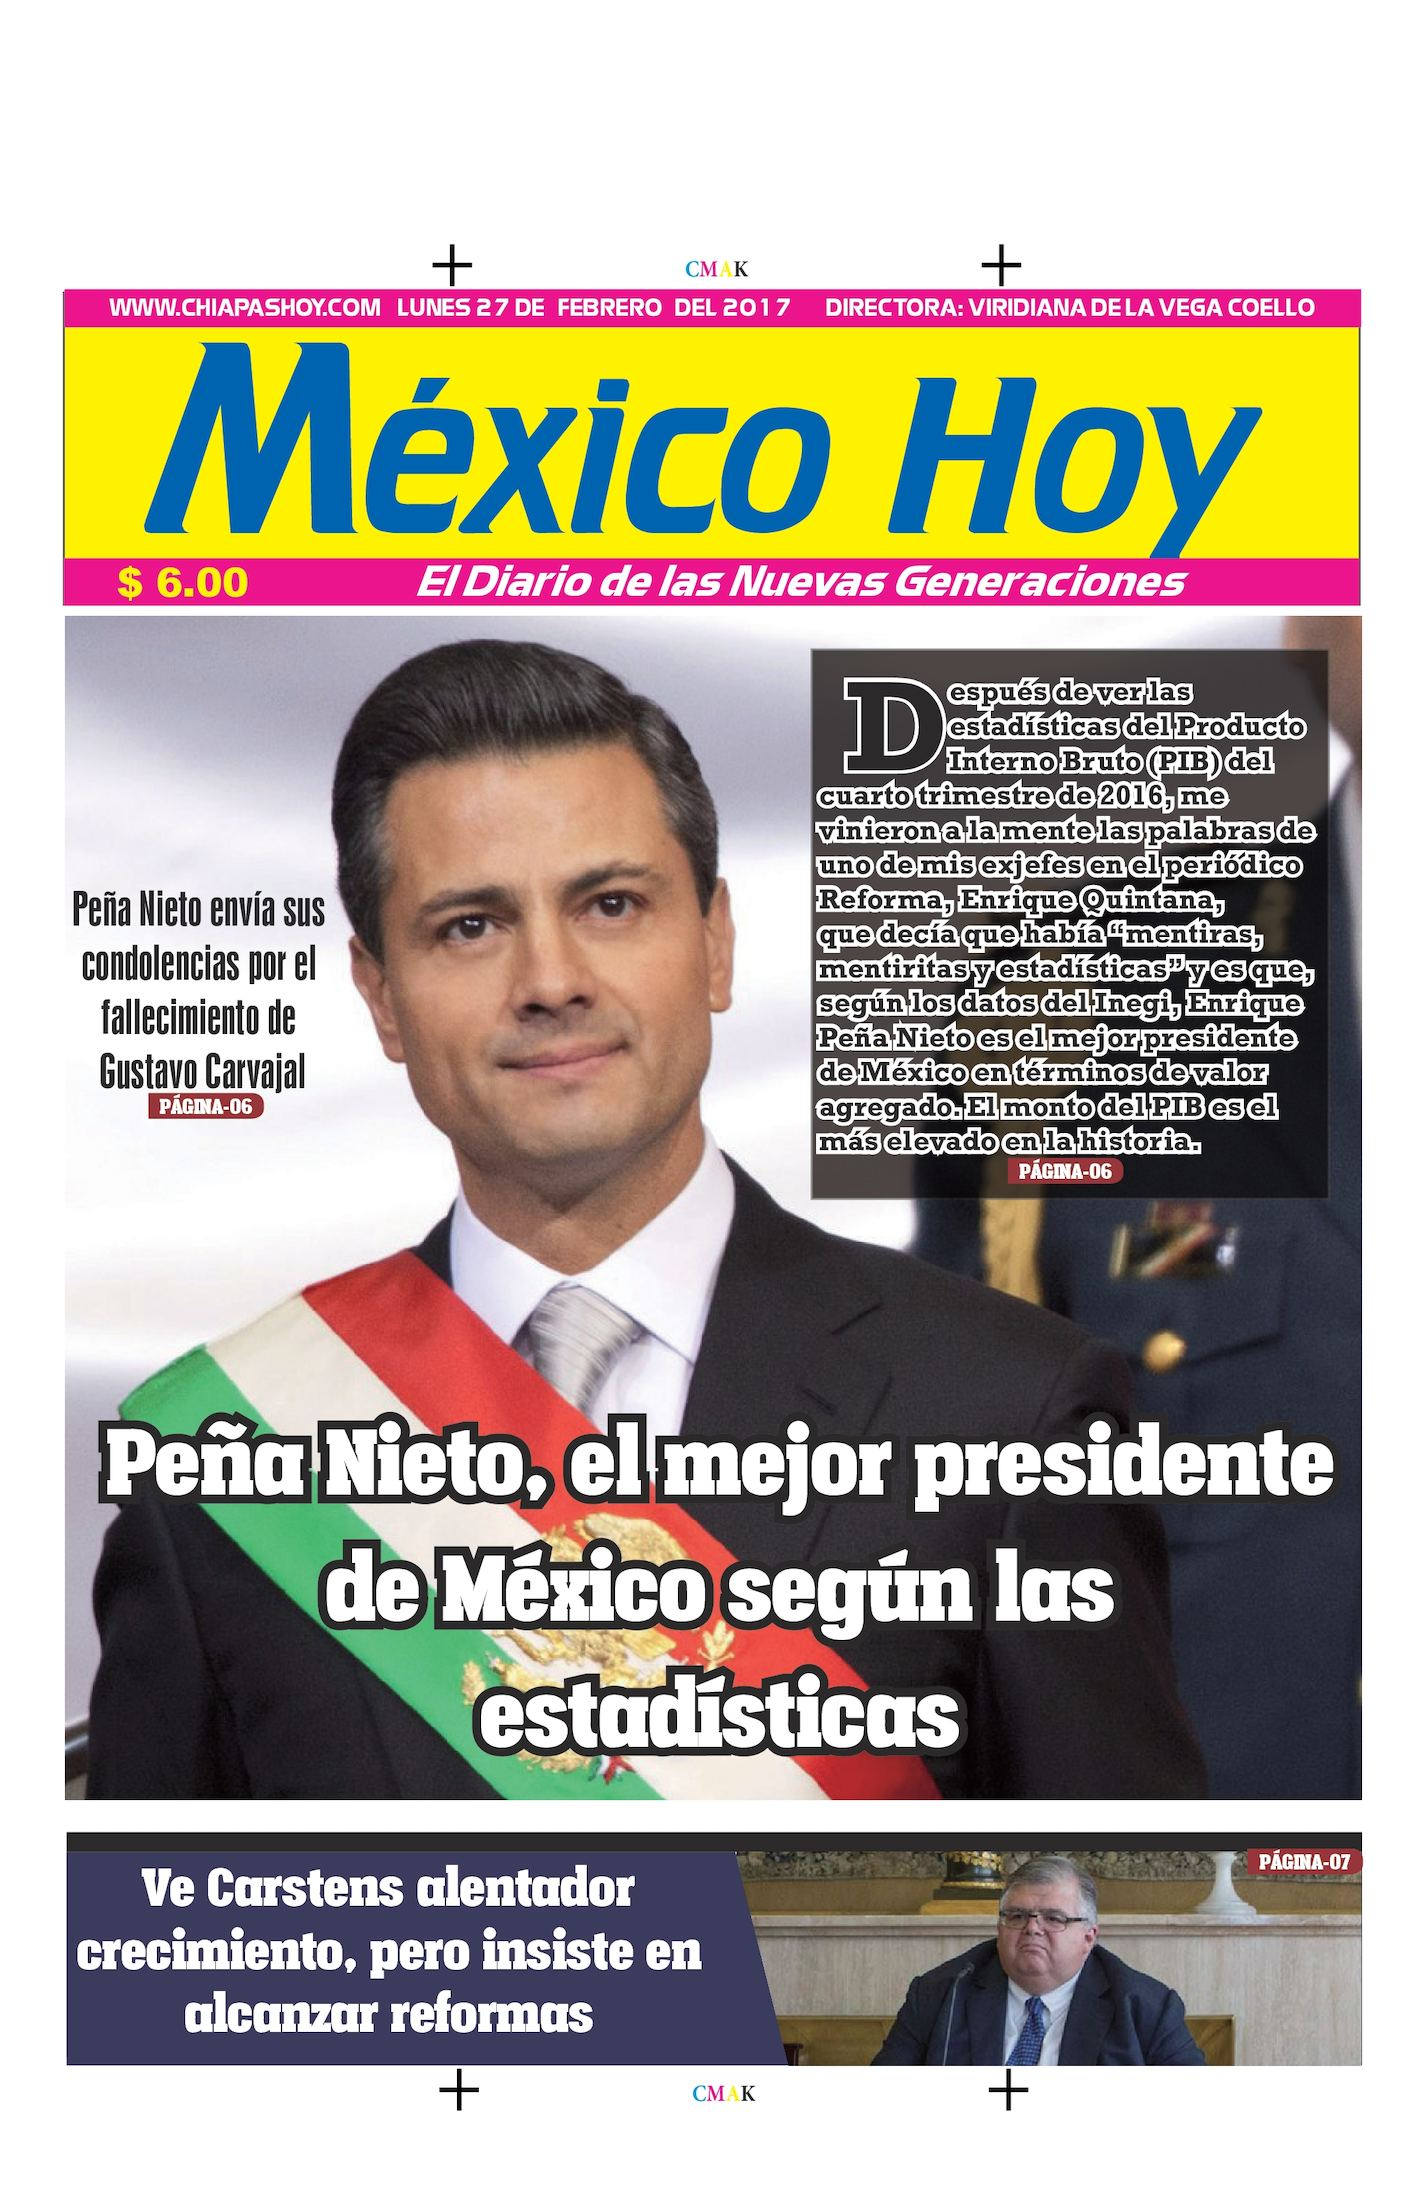 Mexico Hoy Lunes 27 de Febrero de 2017